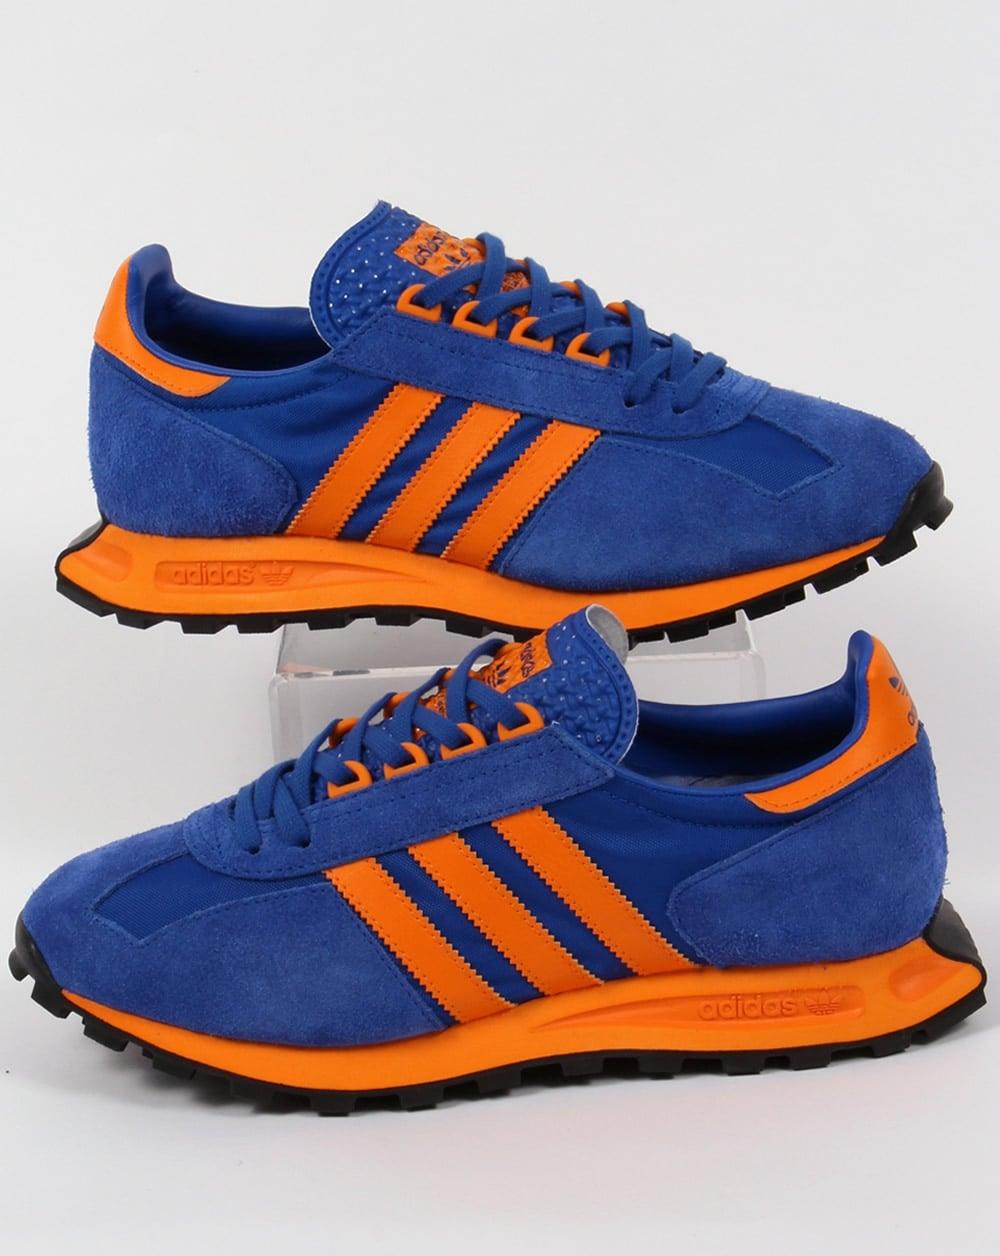 adidas formel 1 trainers power blue orange originals 2016 shoes prototype. Black Bedroom Furniture Sets. Home Design Ideas